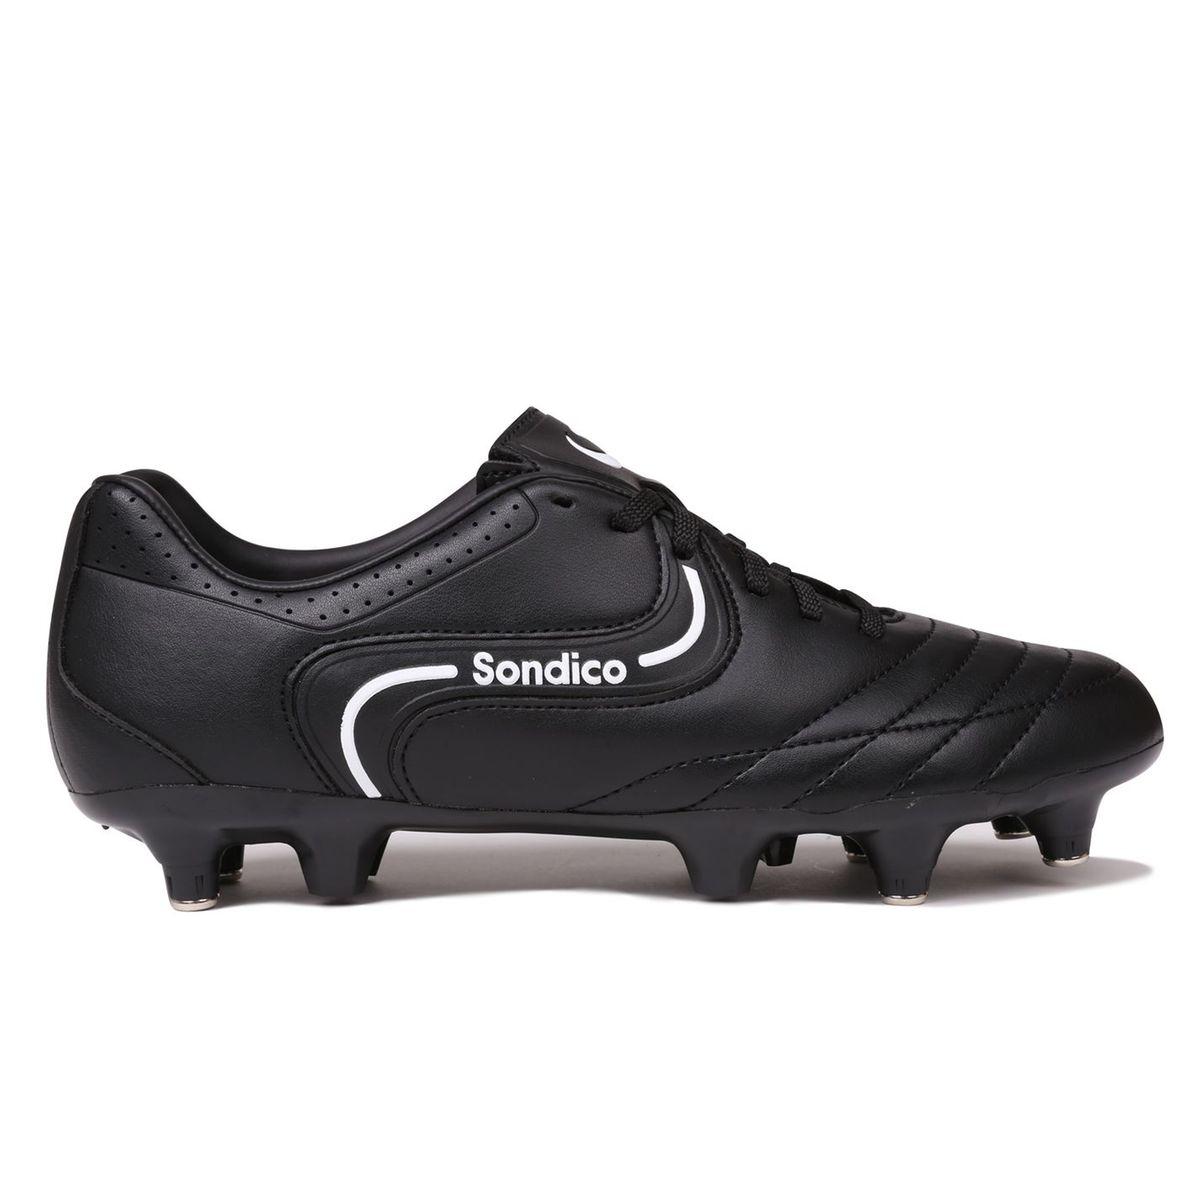 Chaussures de foot terrain mou